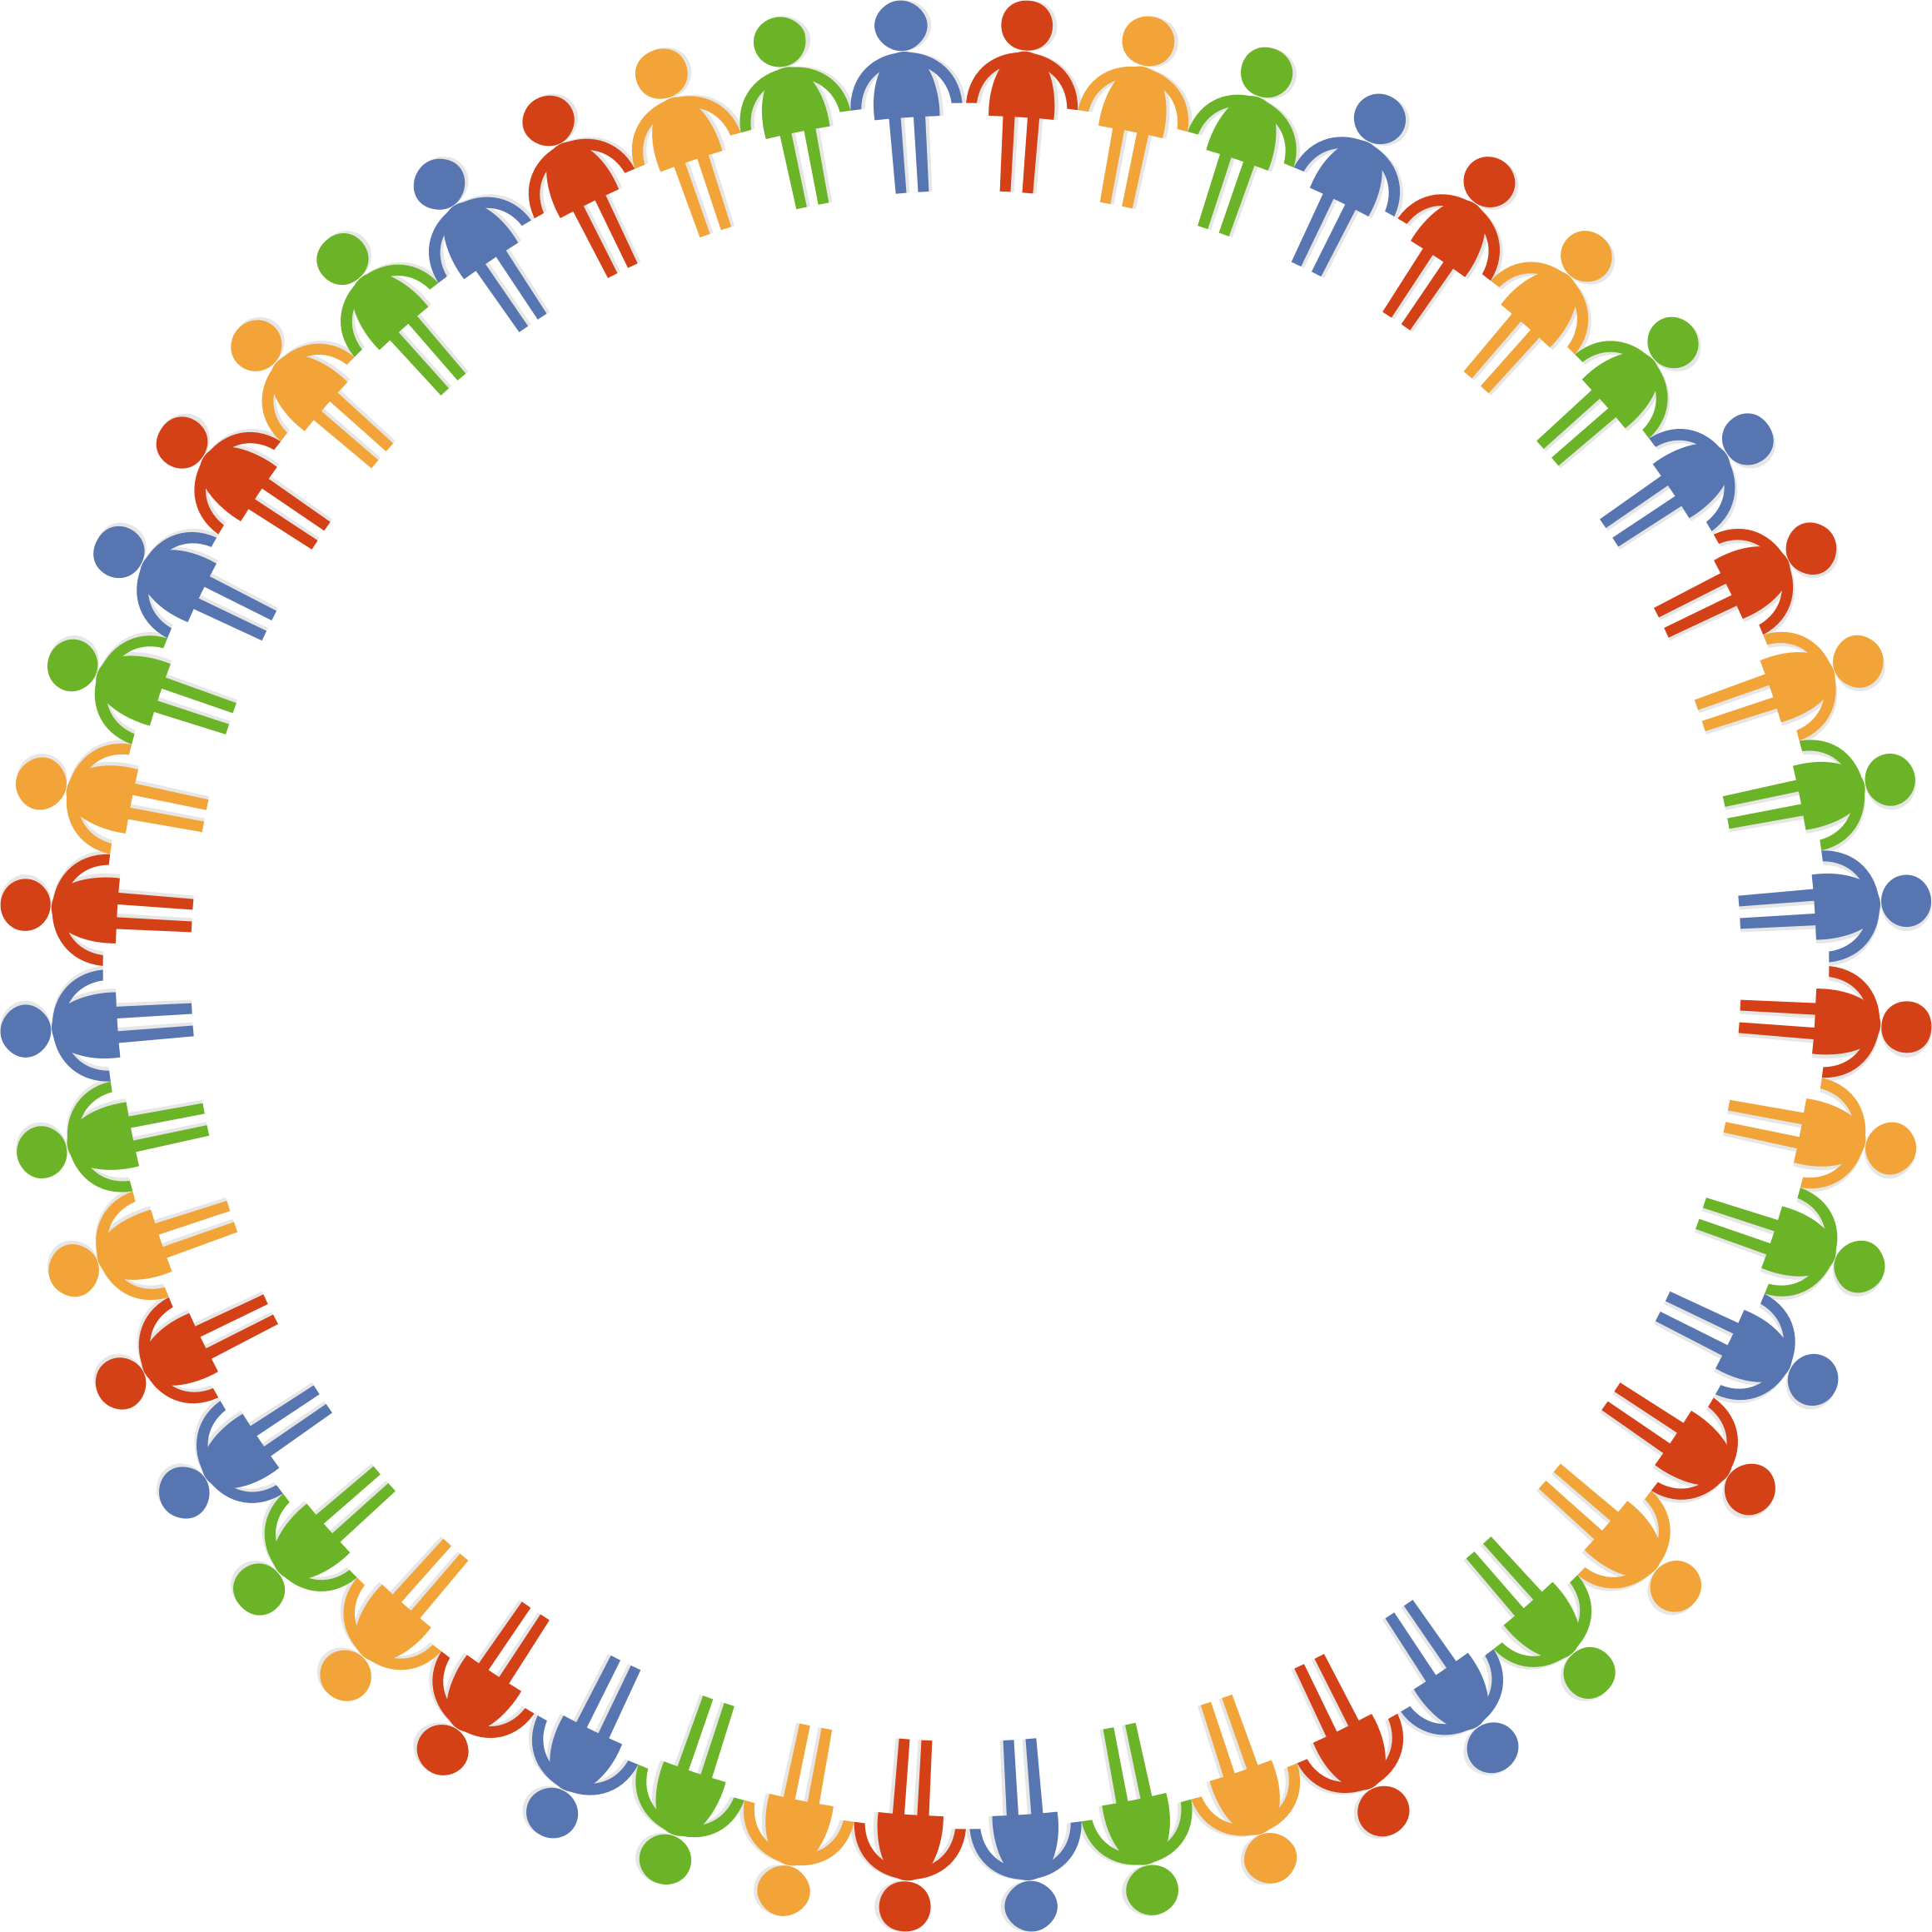 Circle clipart community. Big image png